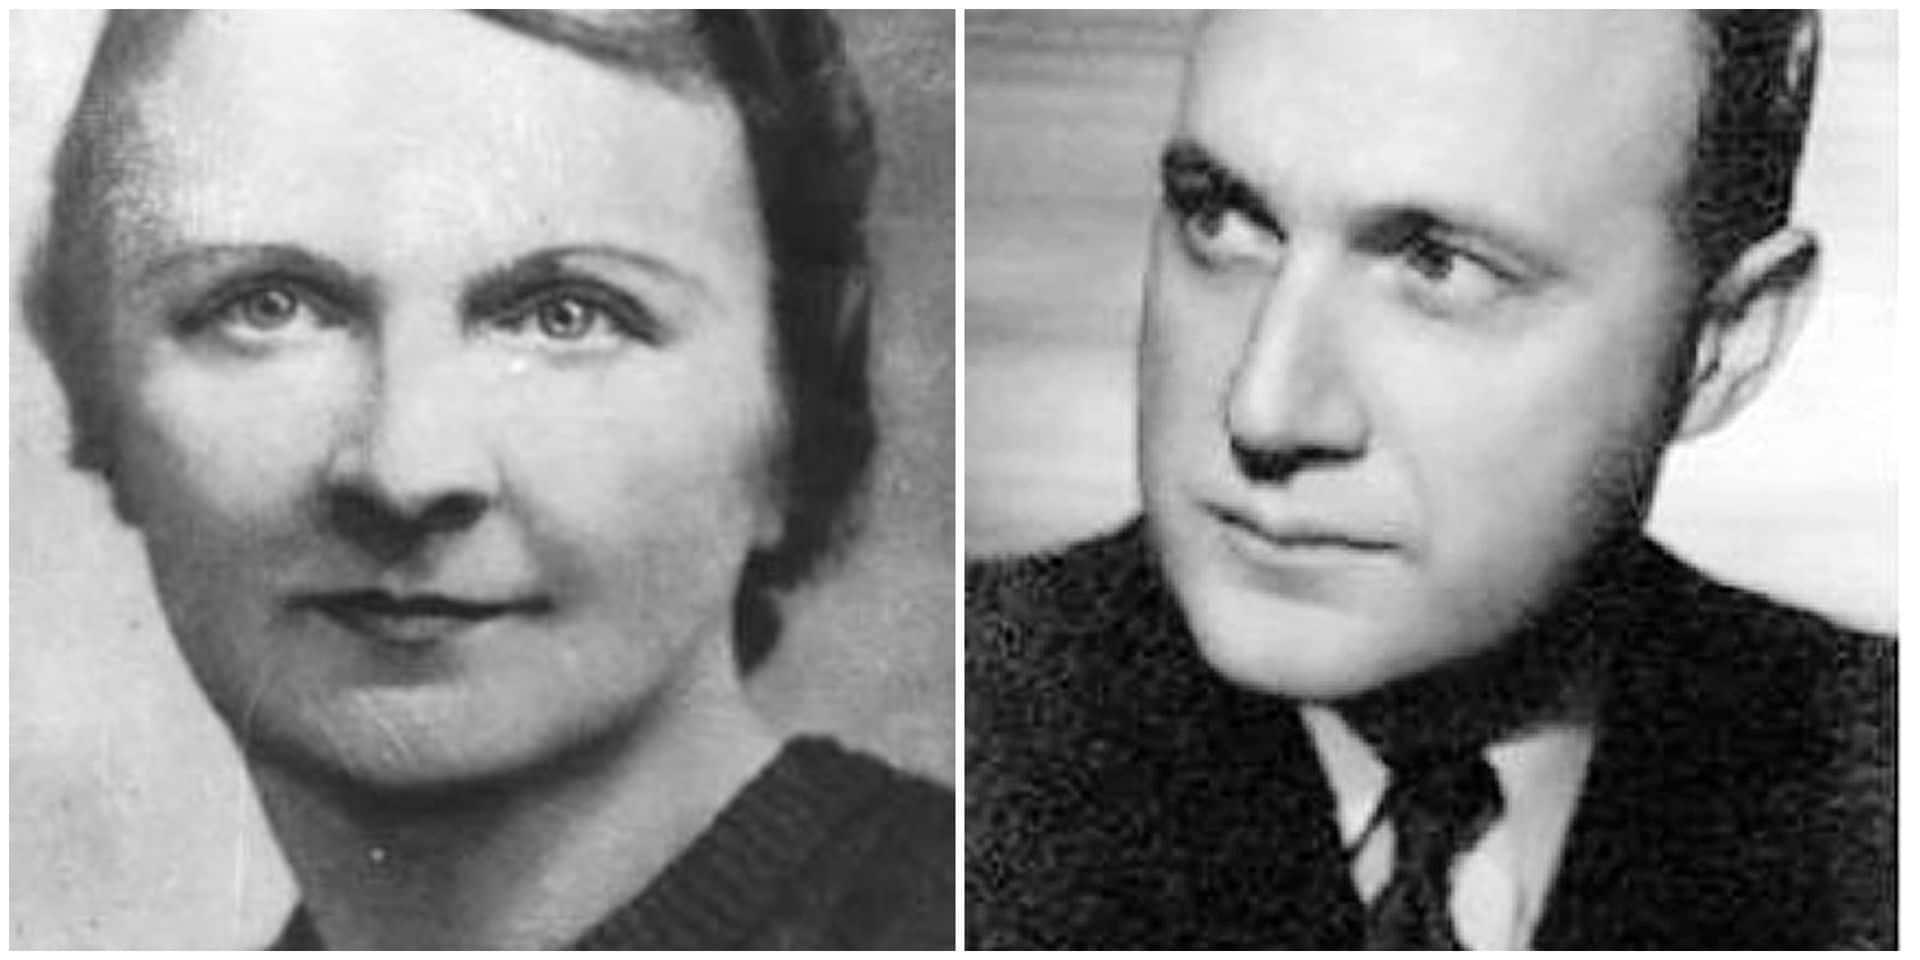 L'Alsacienne Berty Albrecht et l'agent secret Gilbert Renault.